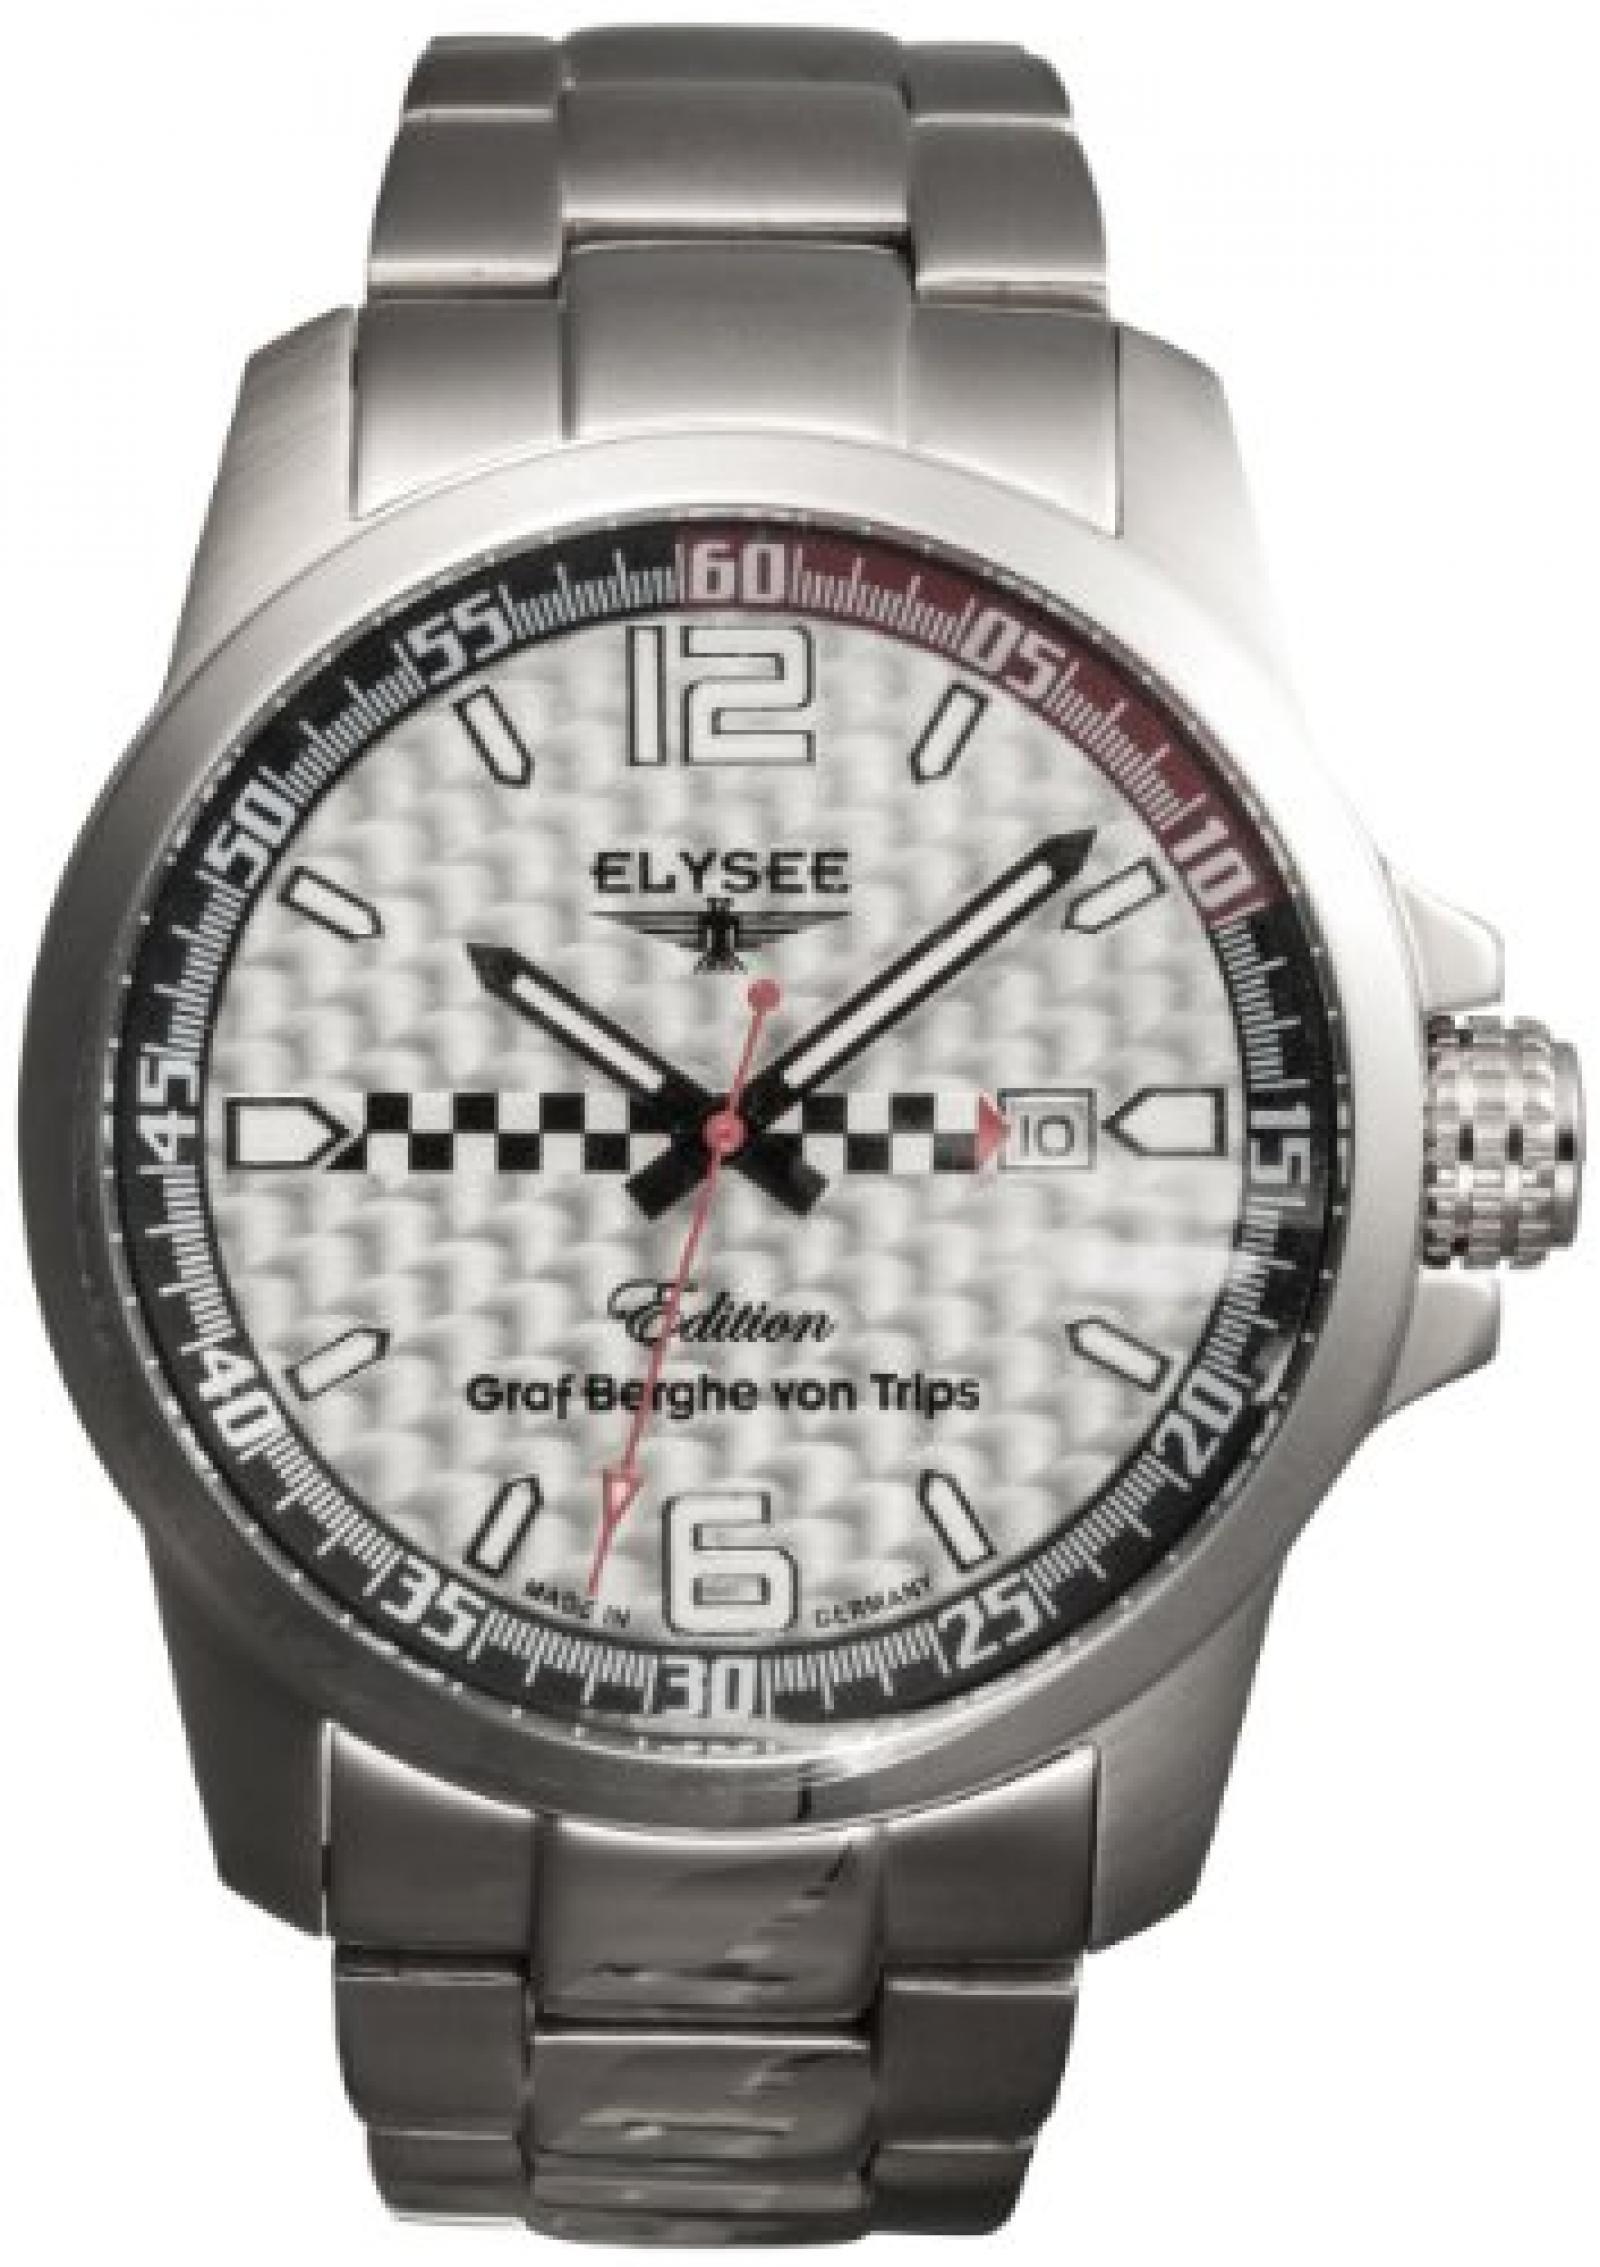 Elysee Herren-Armbanduhr Graf Berghe von Trips 80463S